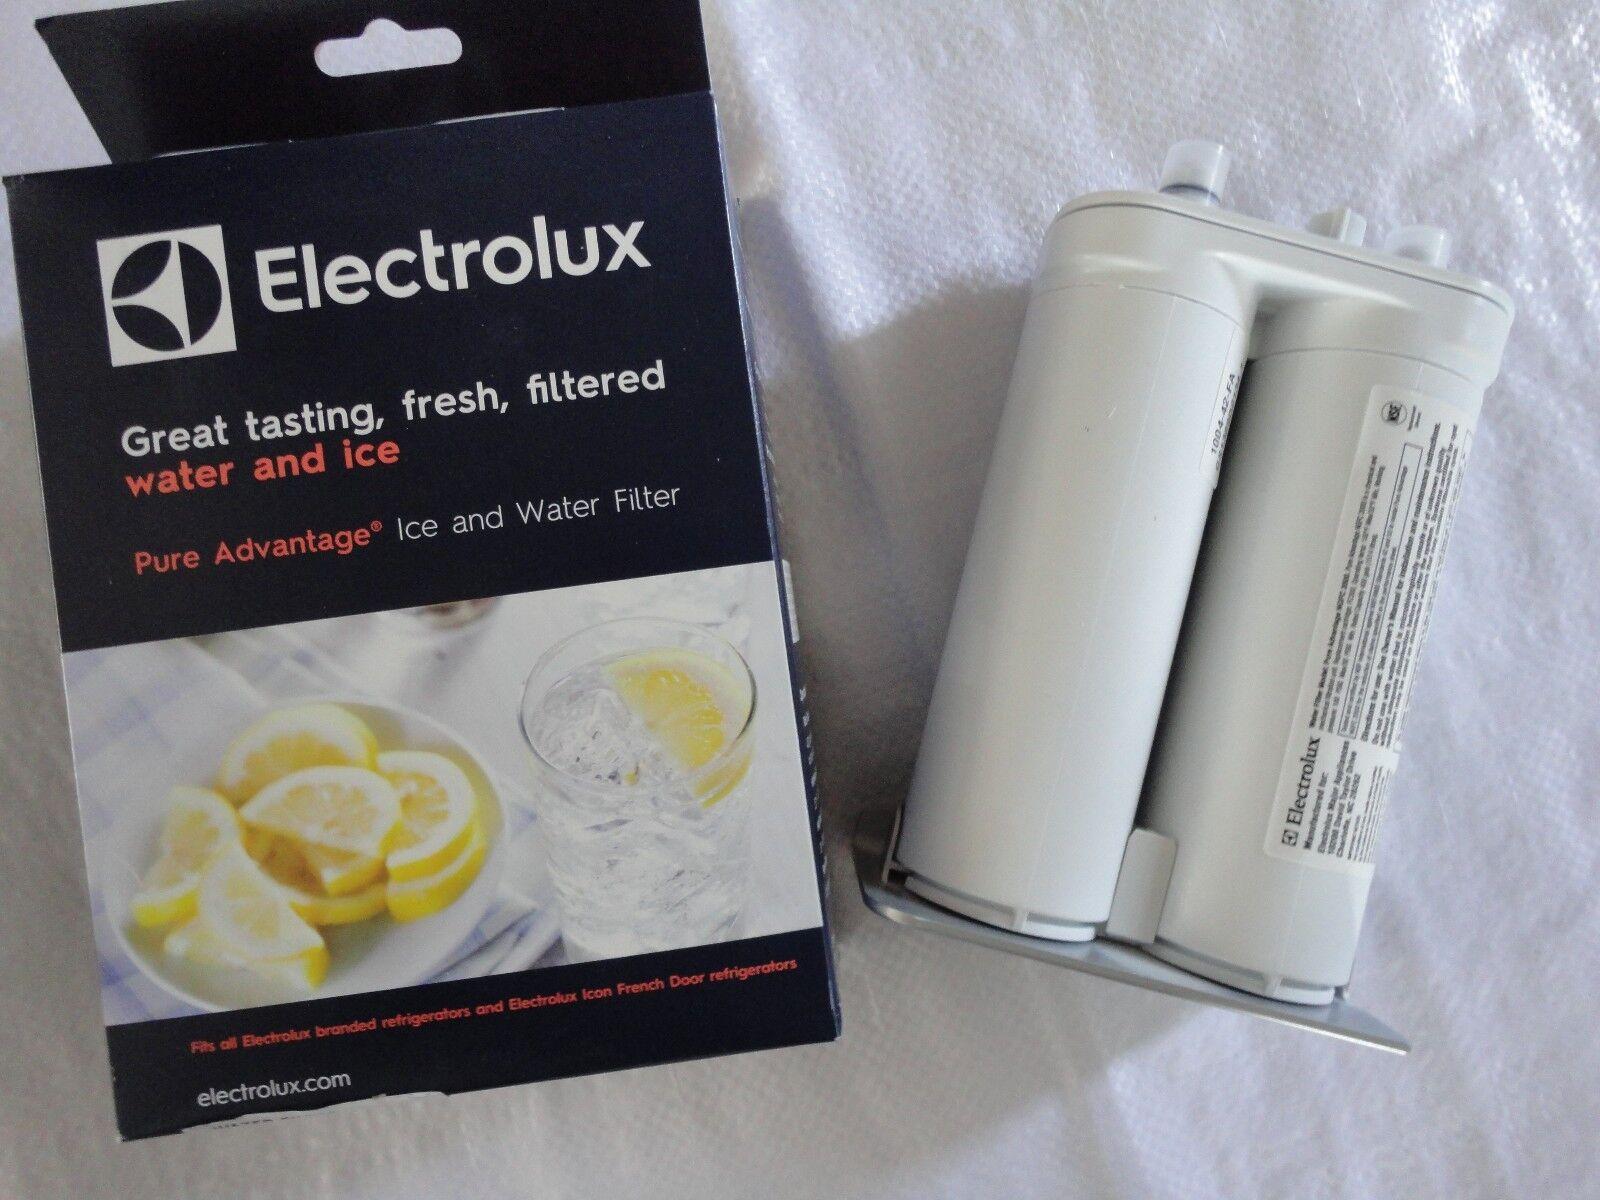 AEG Santo S95628XX Electrolux Pure Pure Pure Advantage fridge ice water filter cartridge 16f35b